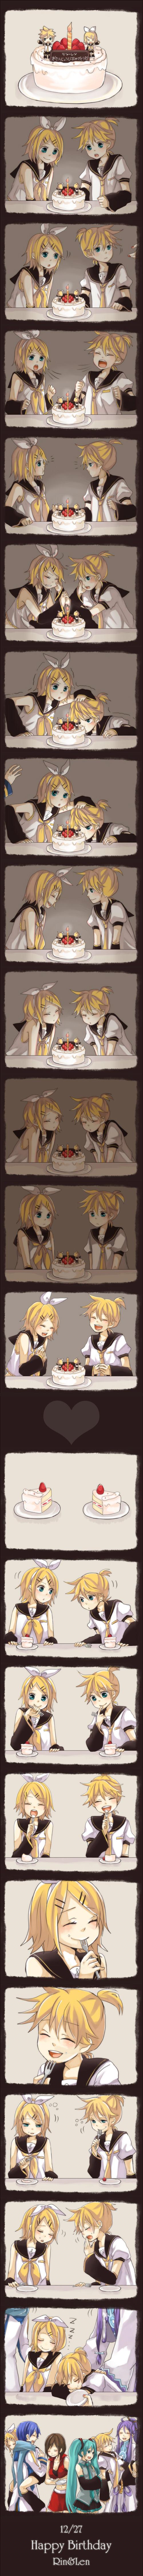 Tags: Anime, Tama Songe, VOCALOID, Kagamine Len, Kamui Gakupo, Kagamine Rin, MEIKO (VOCALOID), Hatsune Miku, KAITO, Strawberry Shortcake